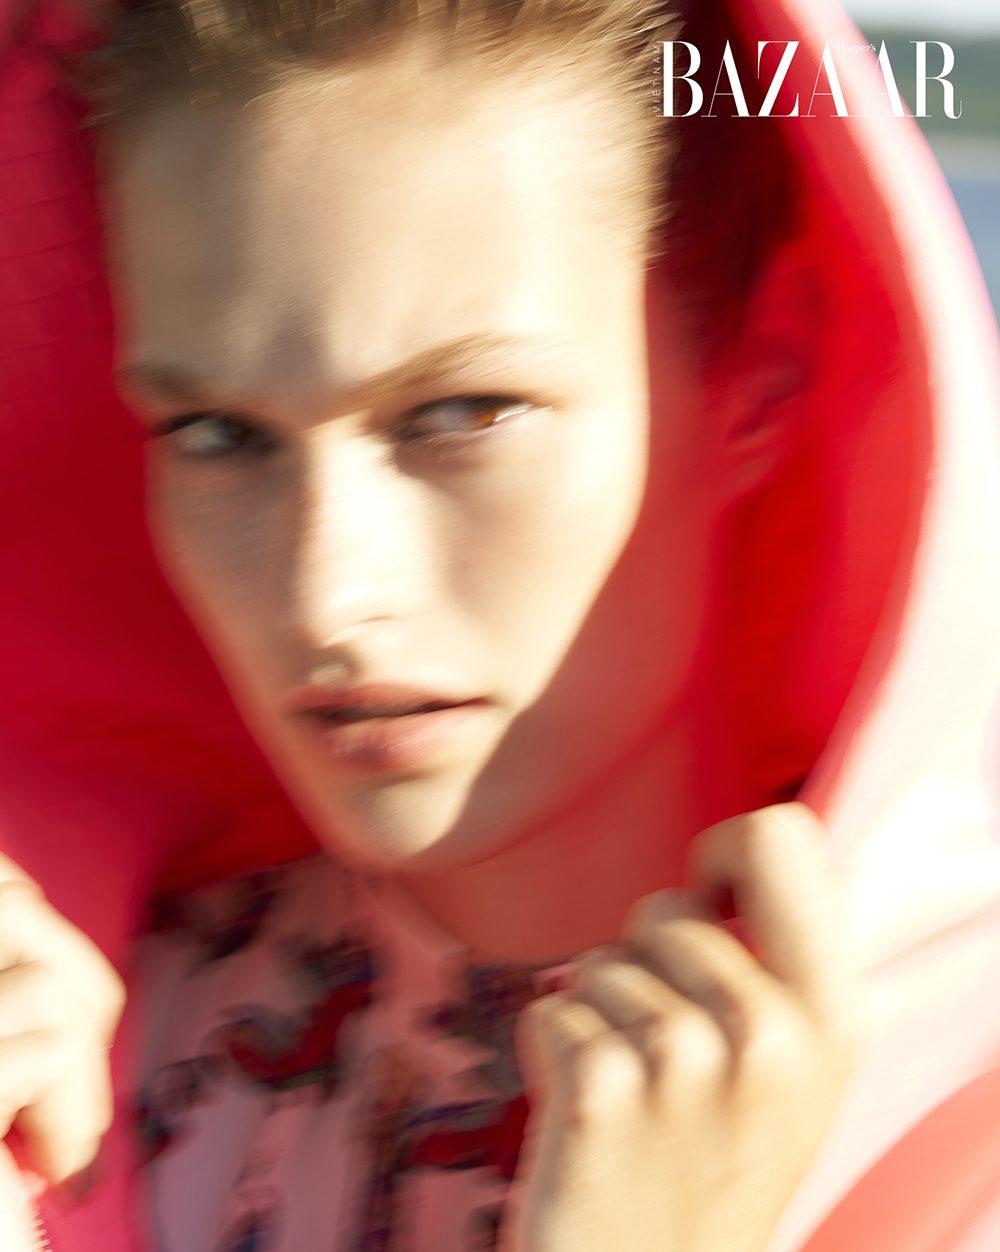 Bộ ảnh Đất Mẹ do Daniele Carettoni sản xuất 5